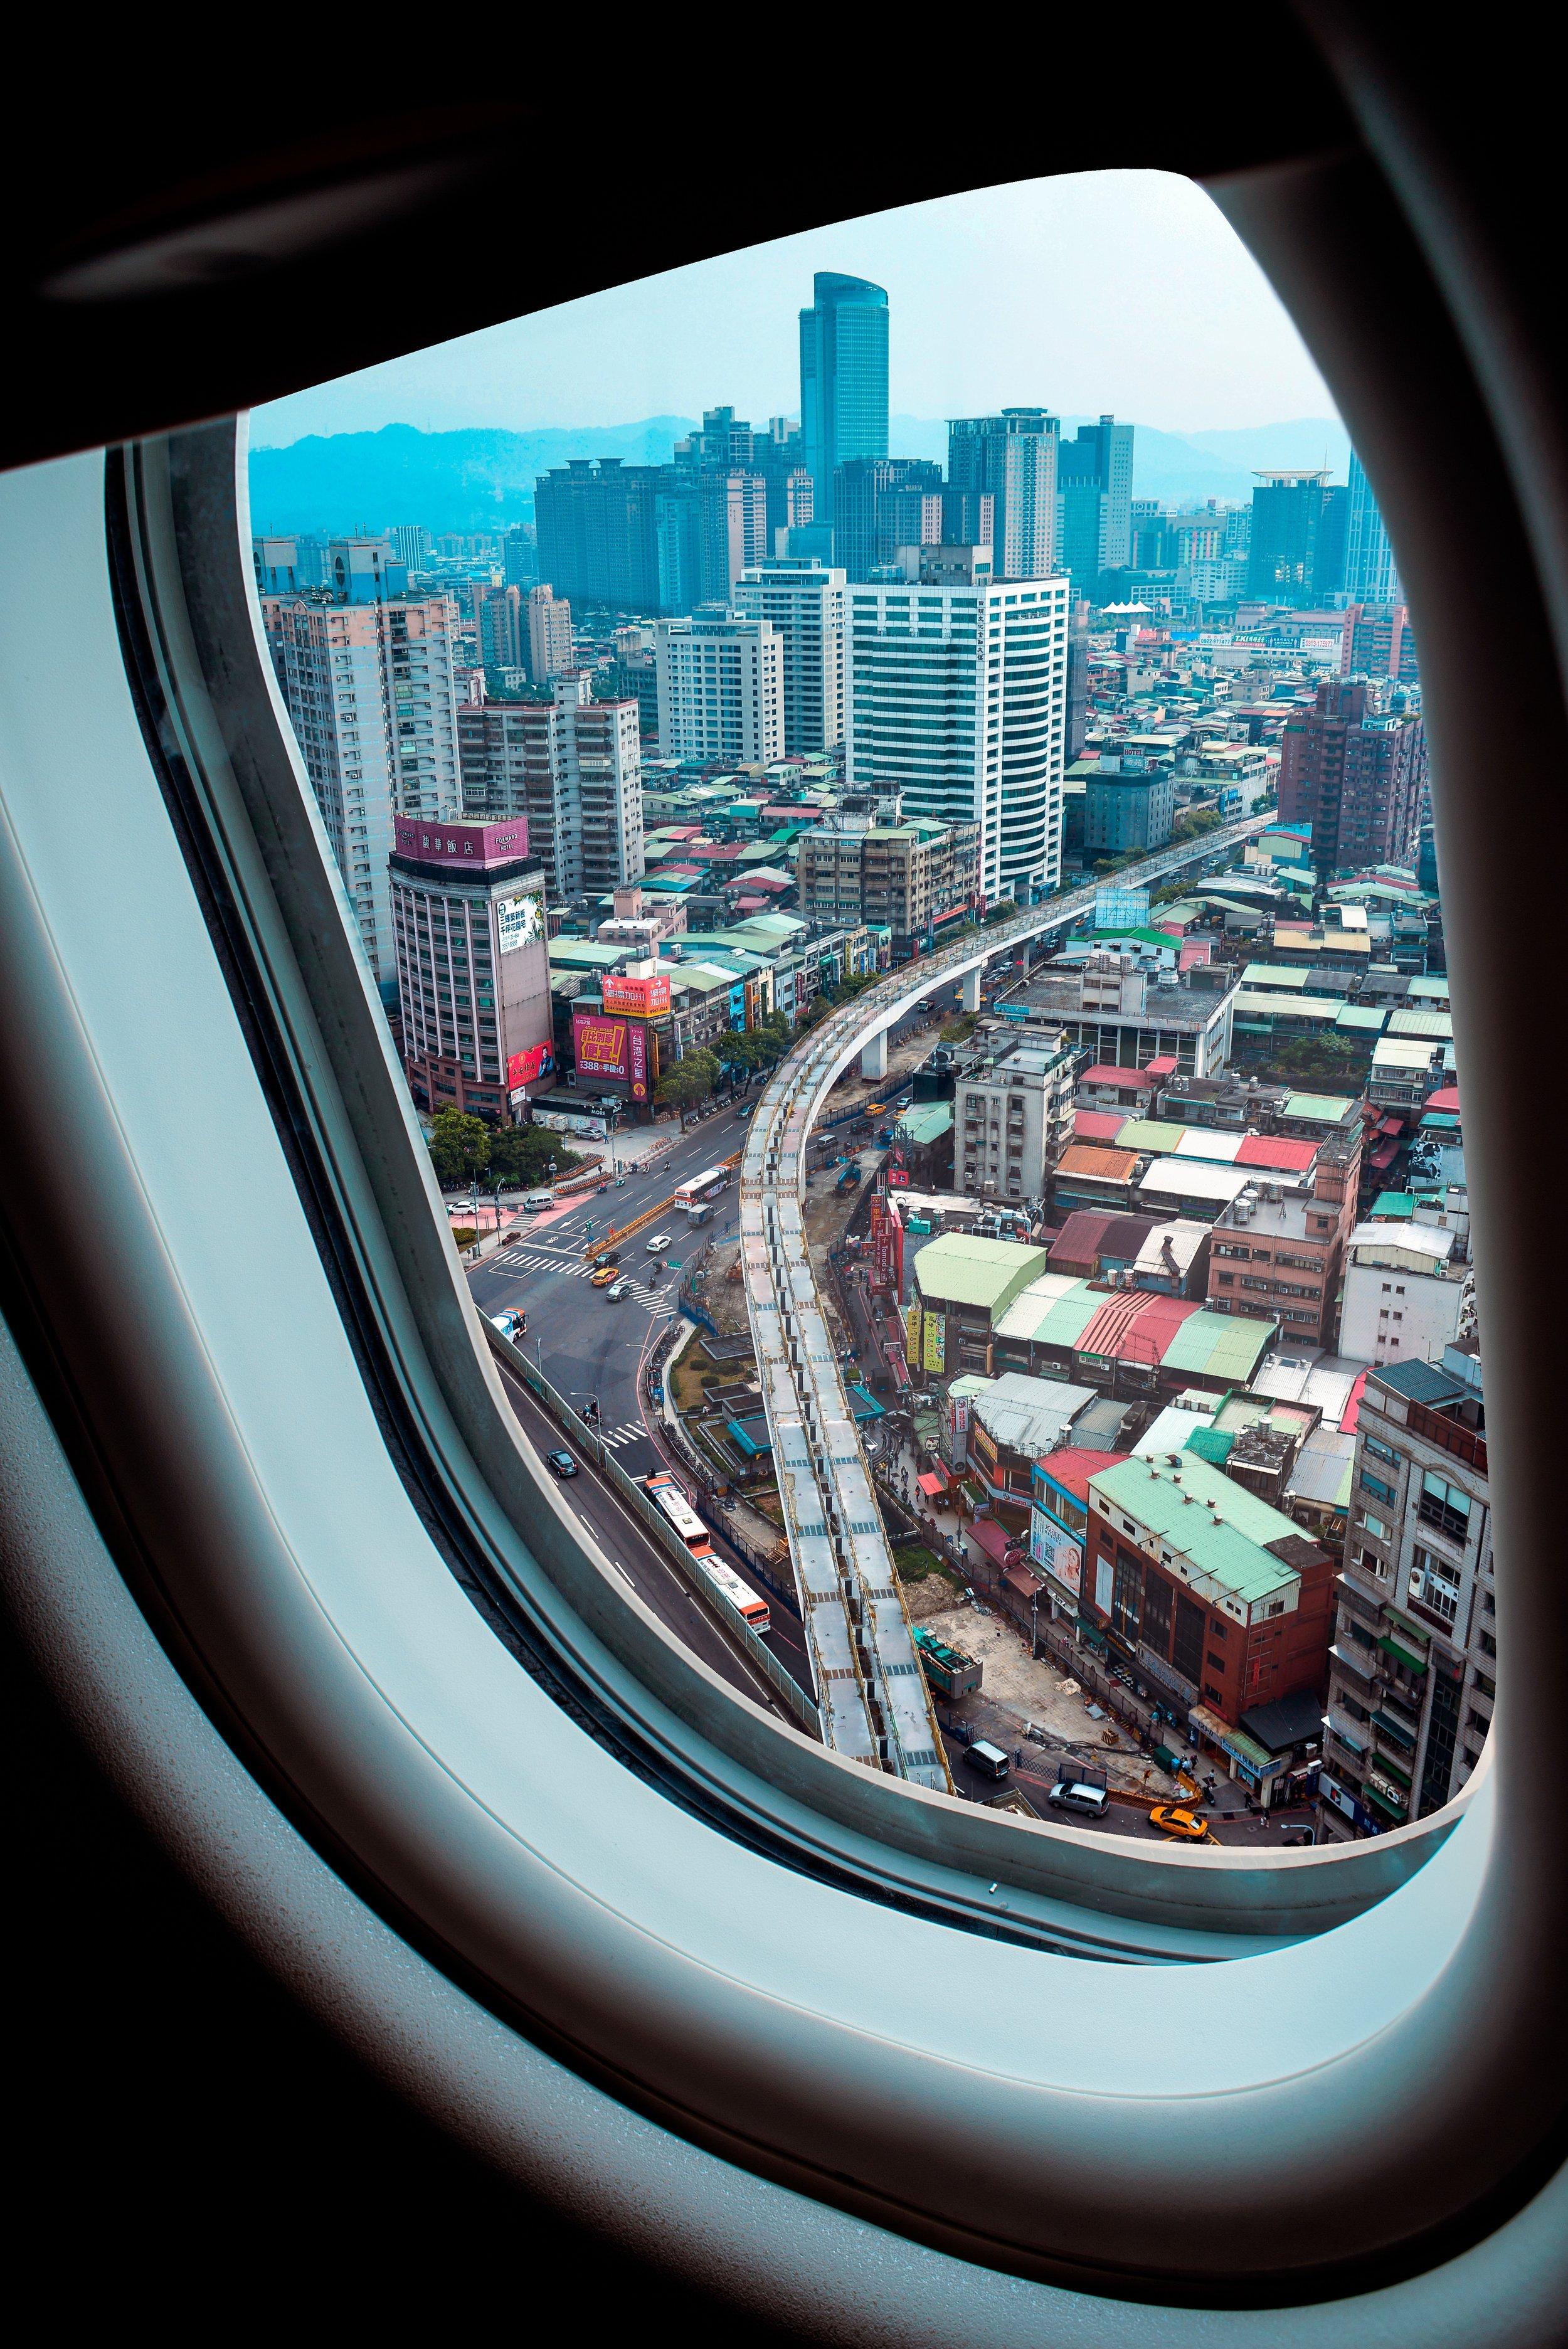 10 Photos From Aircraft Windows -